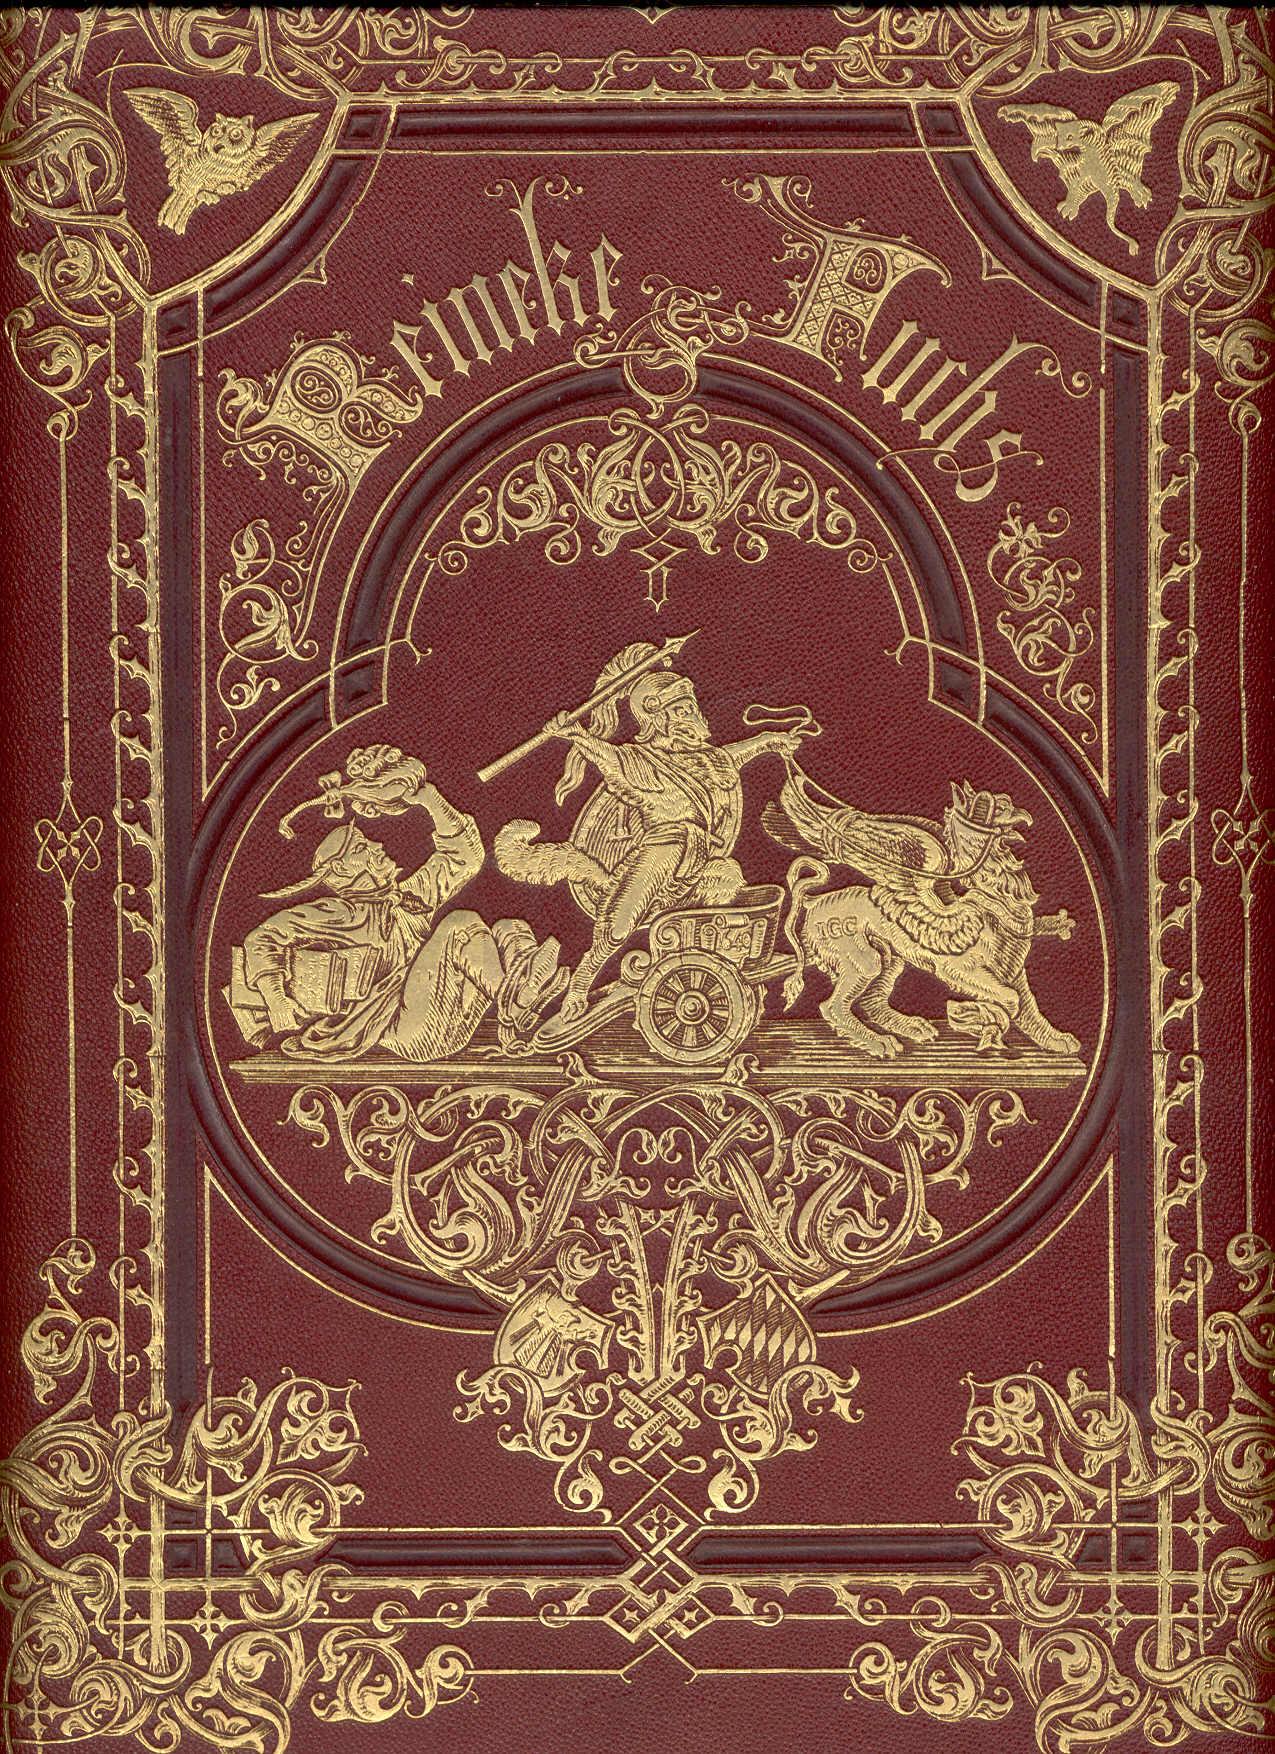 Book Cover Vintage Xda : Vergoldung buch